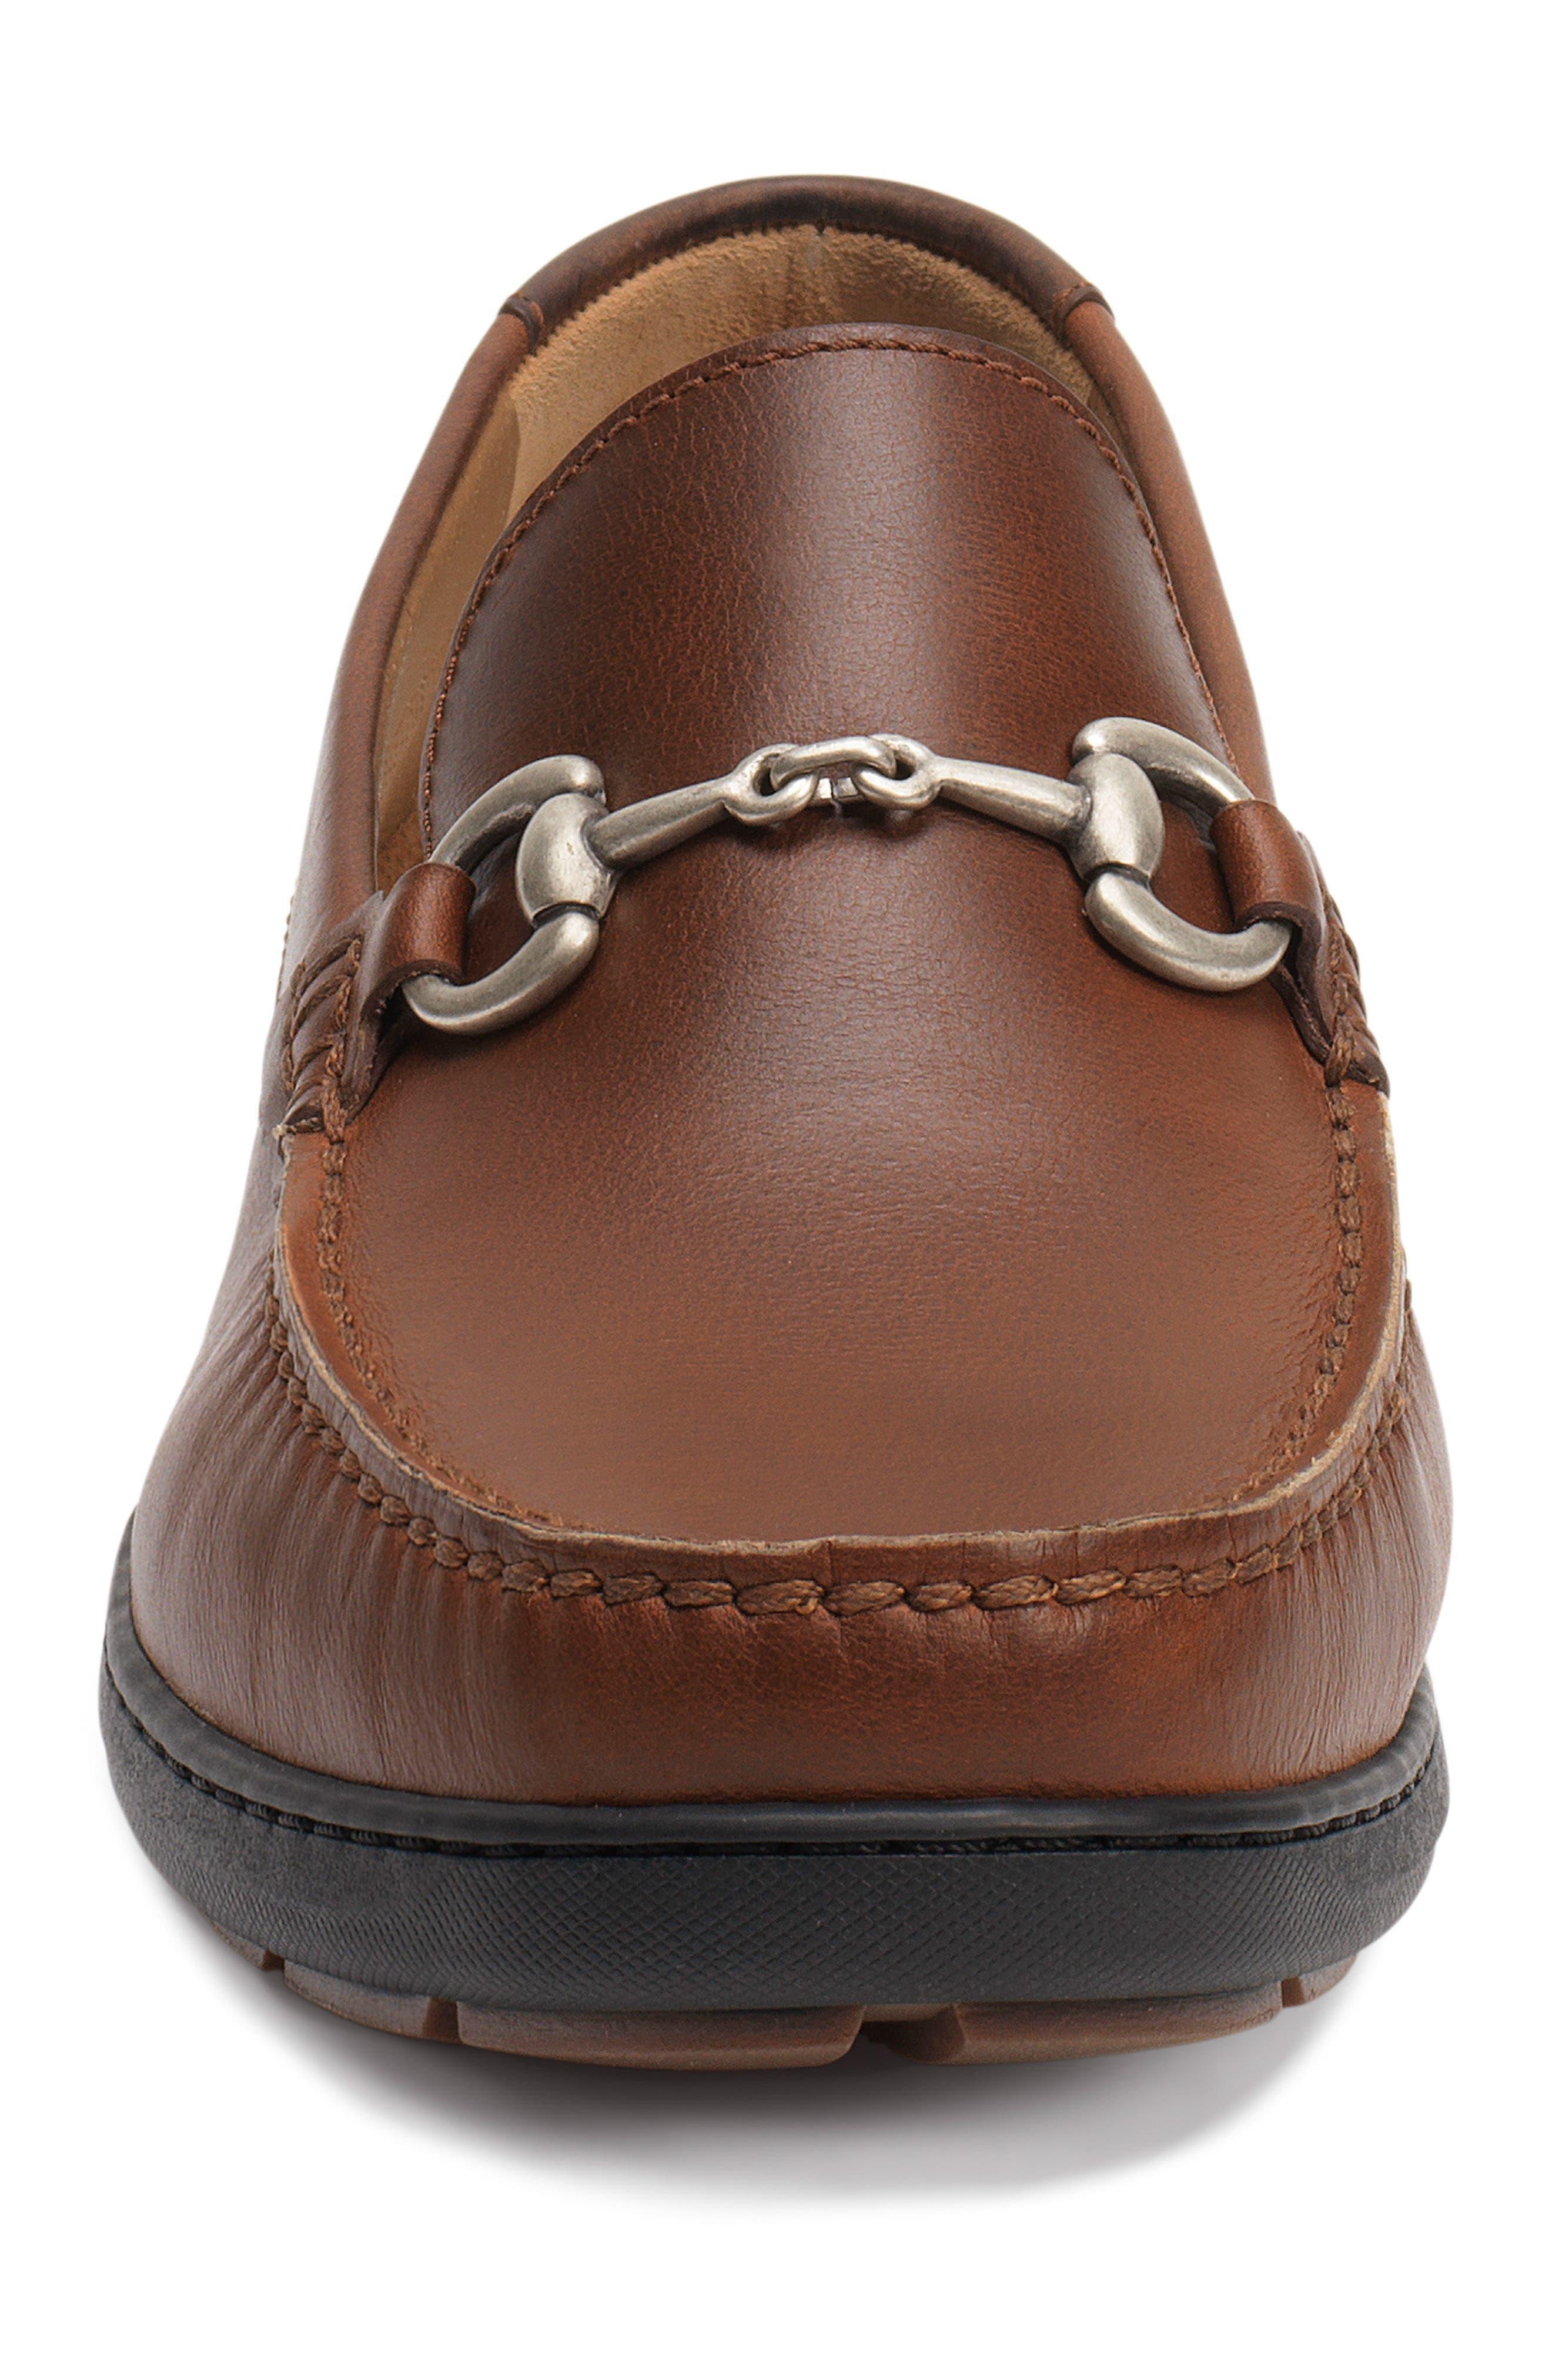 Stalworth Bit Loafer,                             Alternate thumbnail 4, color,                             Brandy Leather